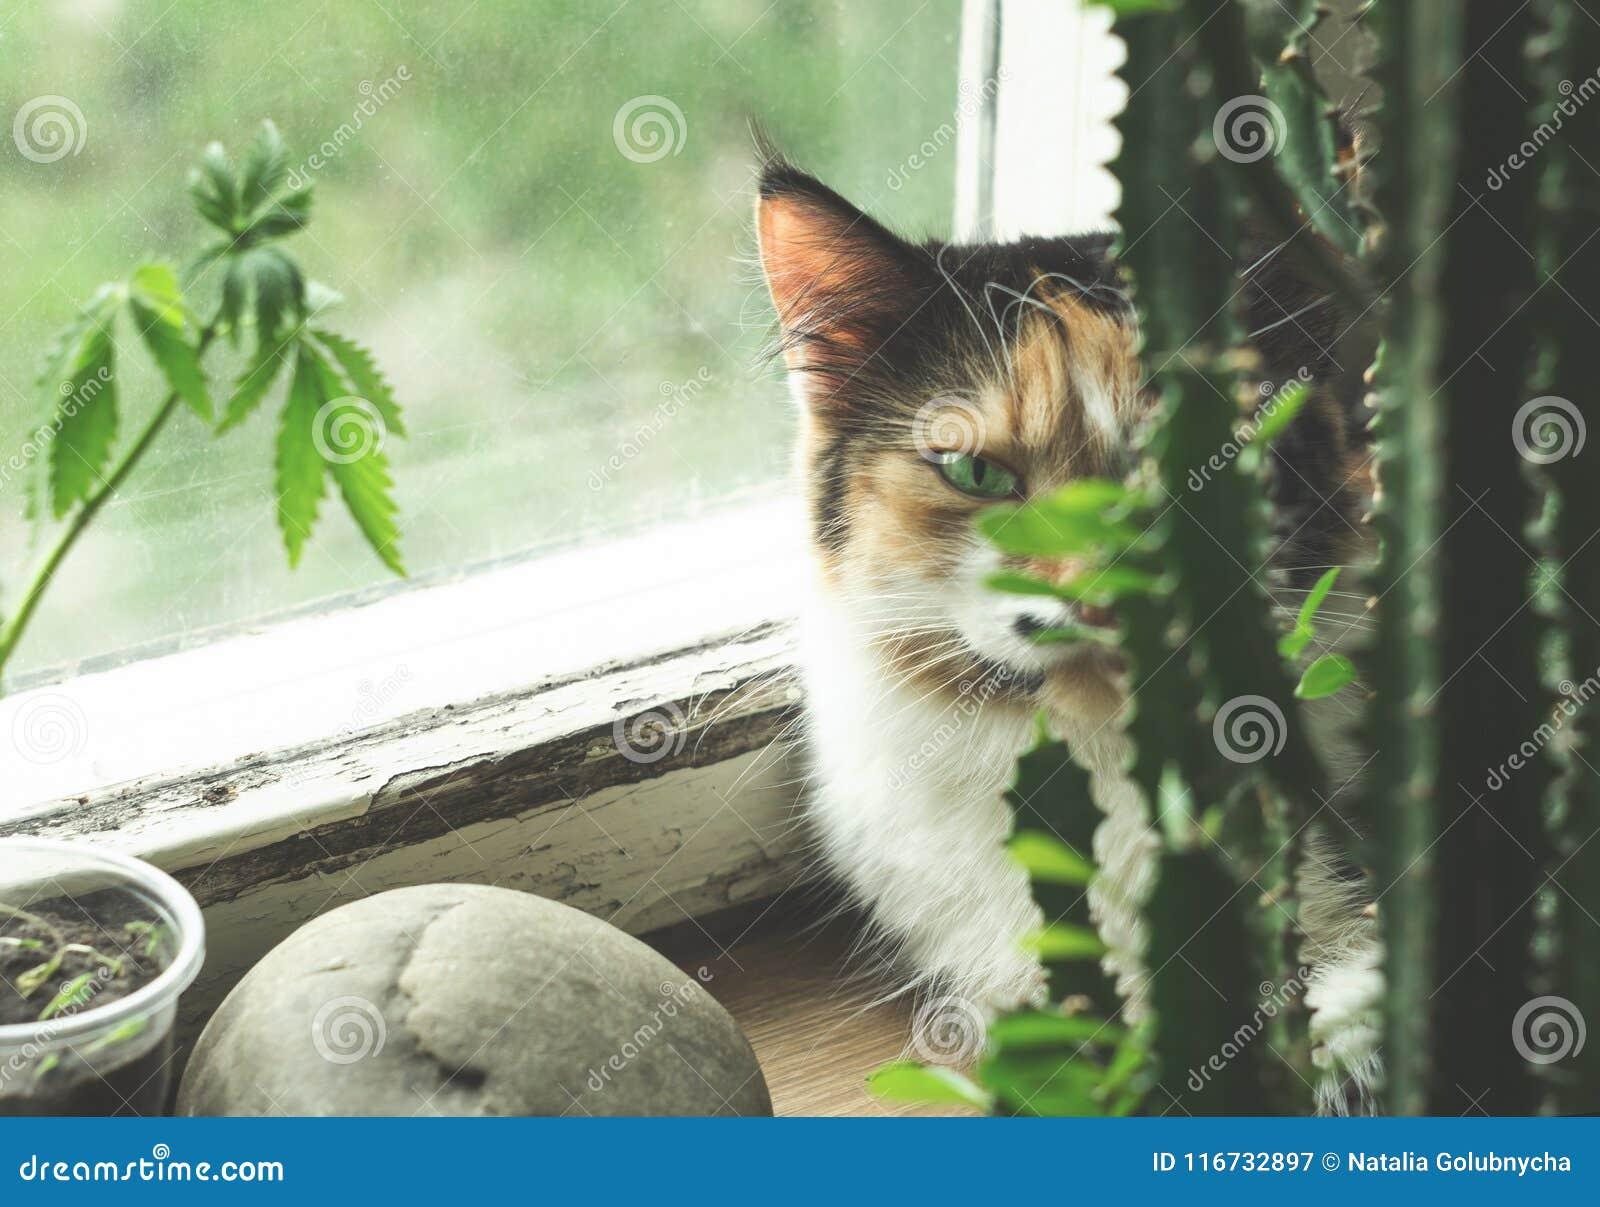 Cat on windowsill, hemp plant and cactus